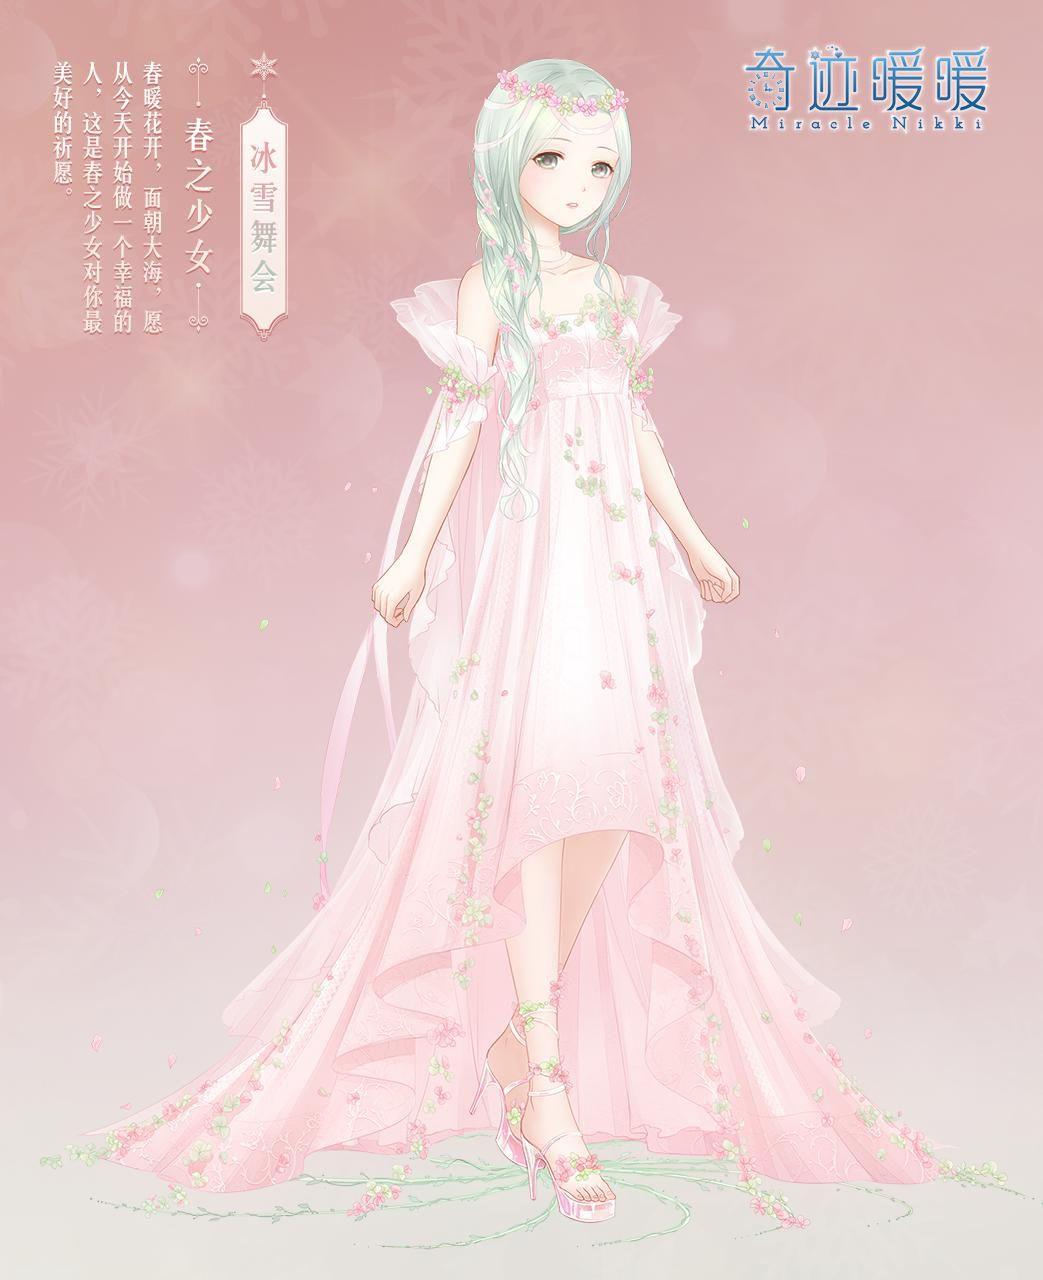 Pin by eva miceviciute on nikki pinterest anime anime outfits